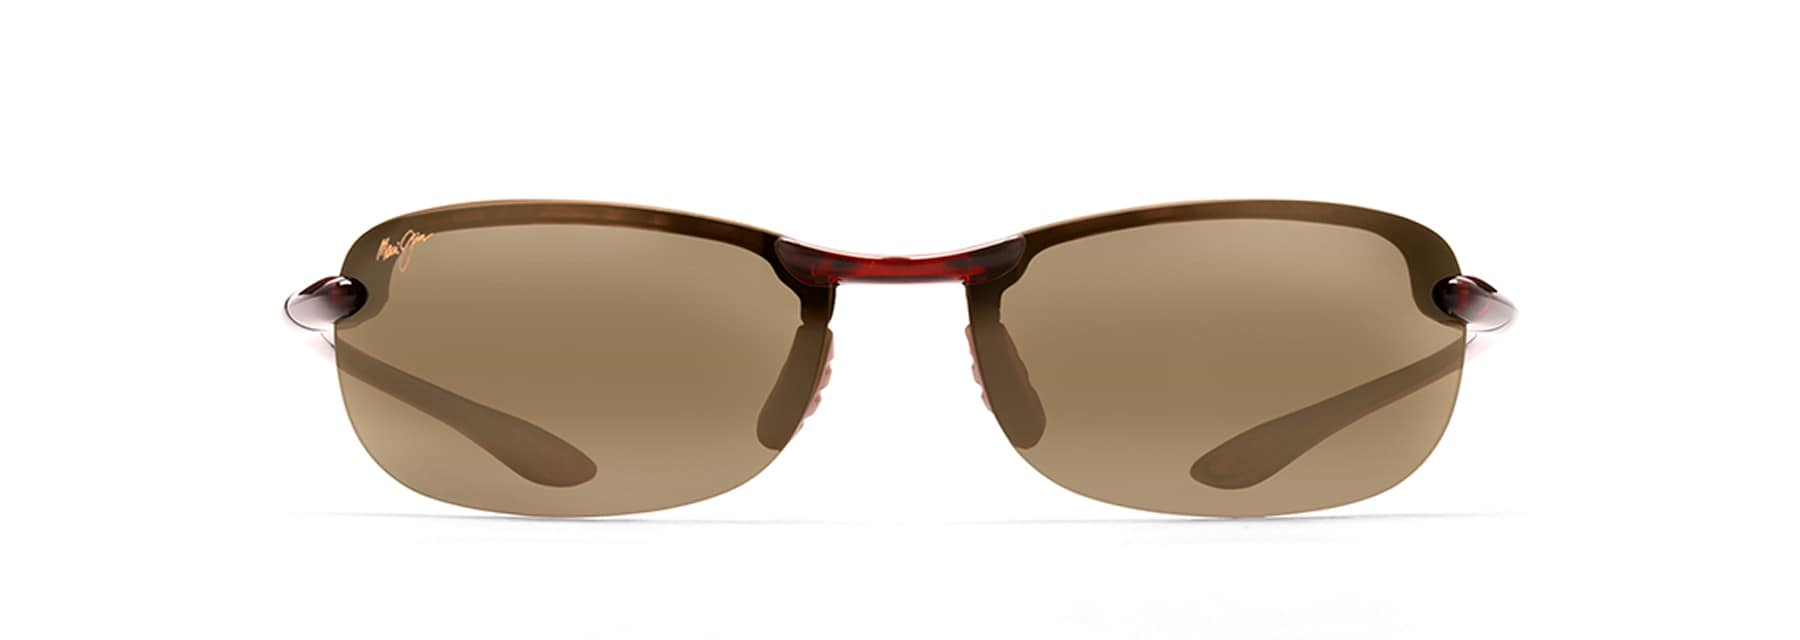 1b3261b2a90 Makaha Polarised Sunglasses